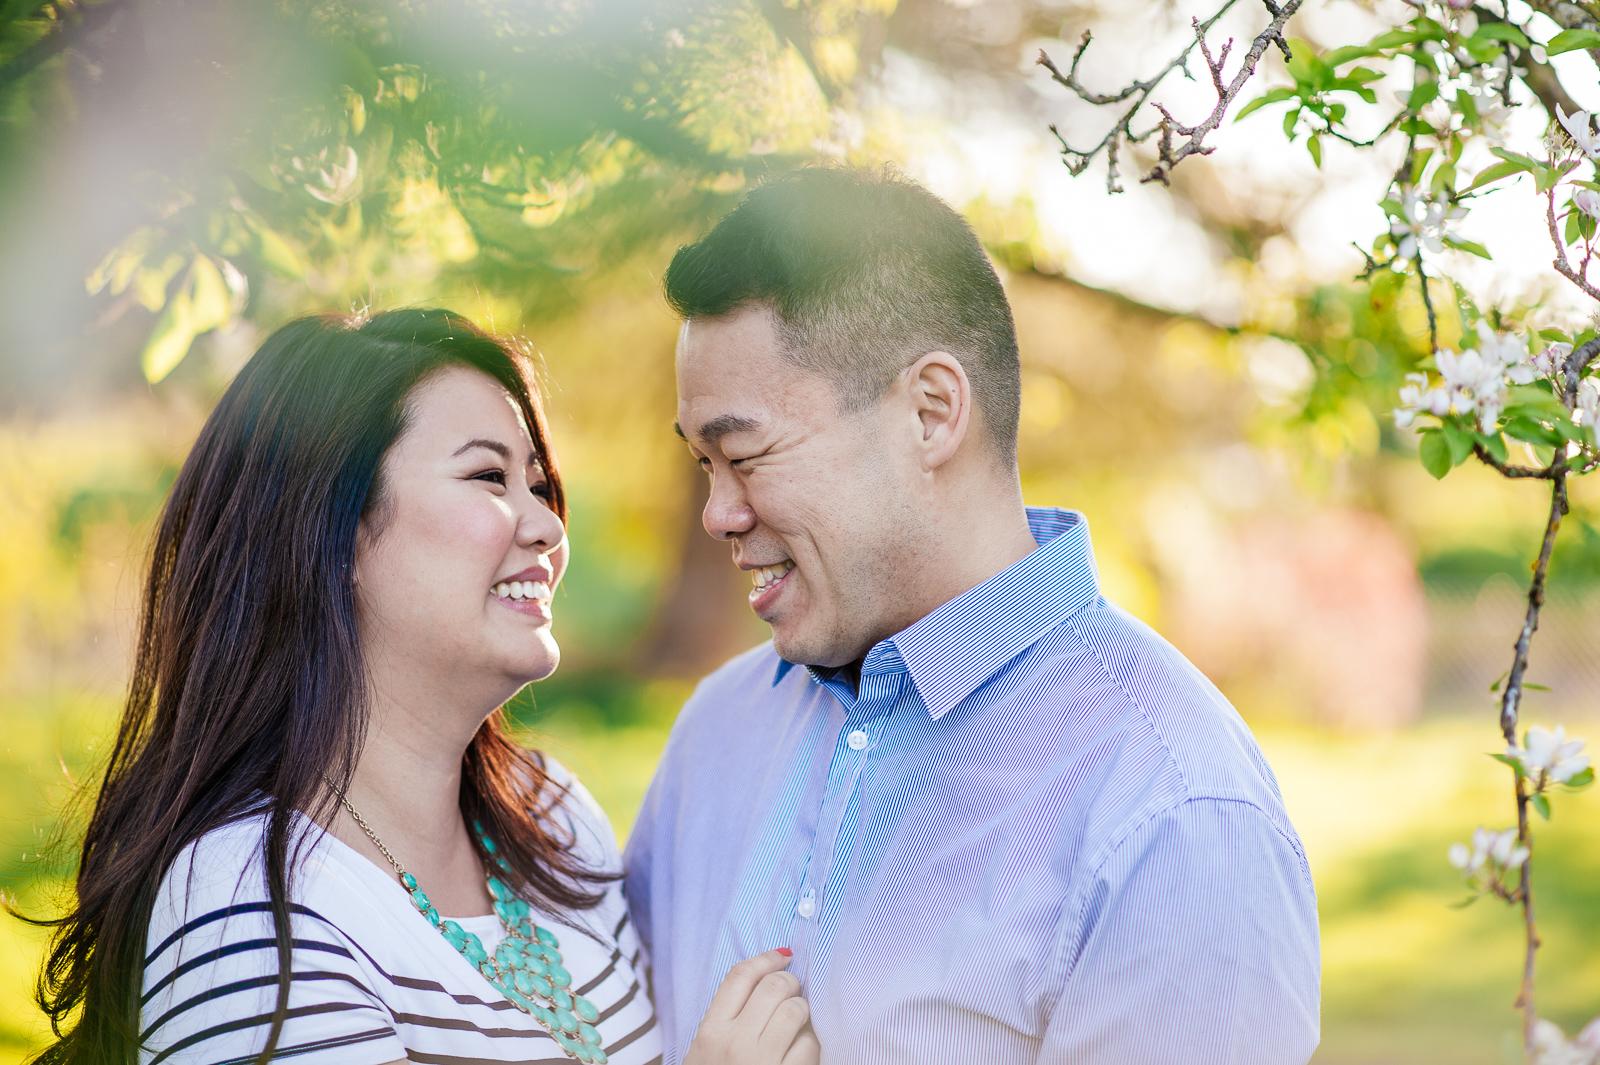 vancouver-island-wedding-photographers-terra-nova-park-engagement-richmond-03.jpg